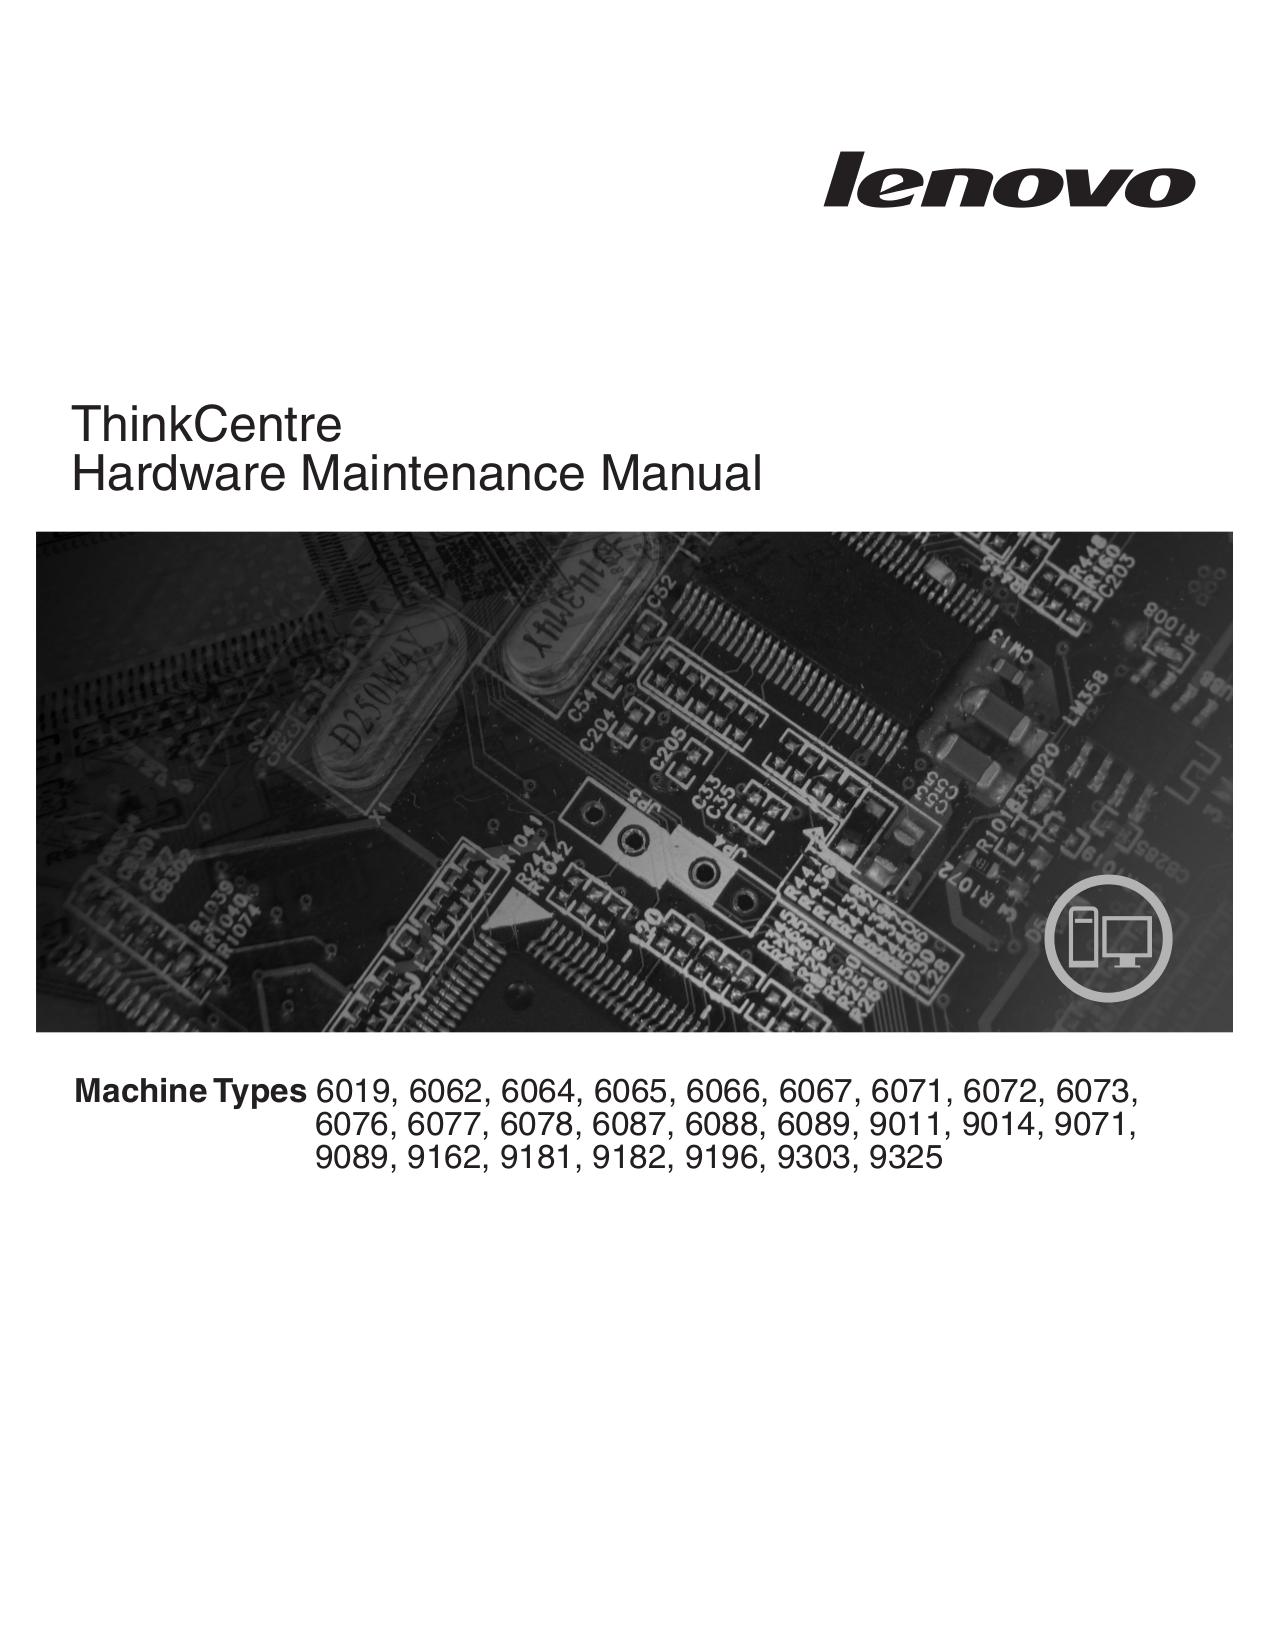 pdf for Lenovo Desktop ThinkCentre M57p 9330 manual